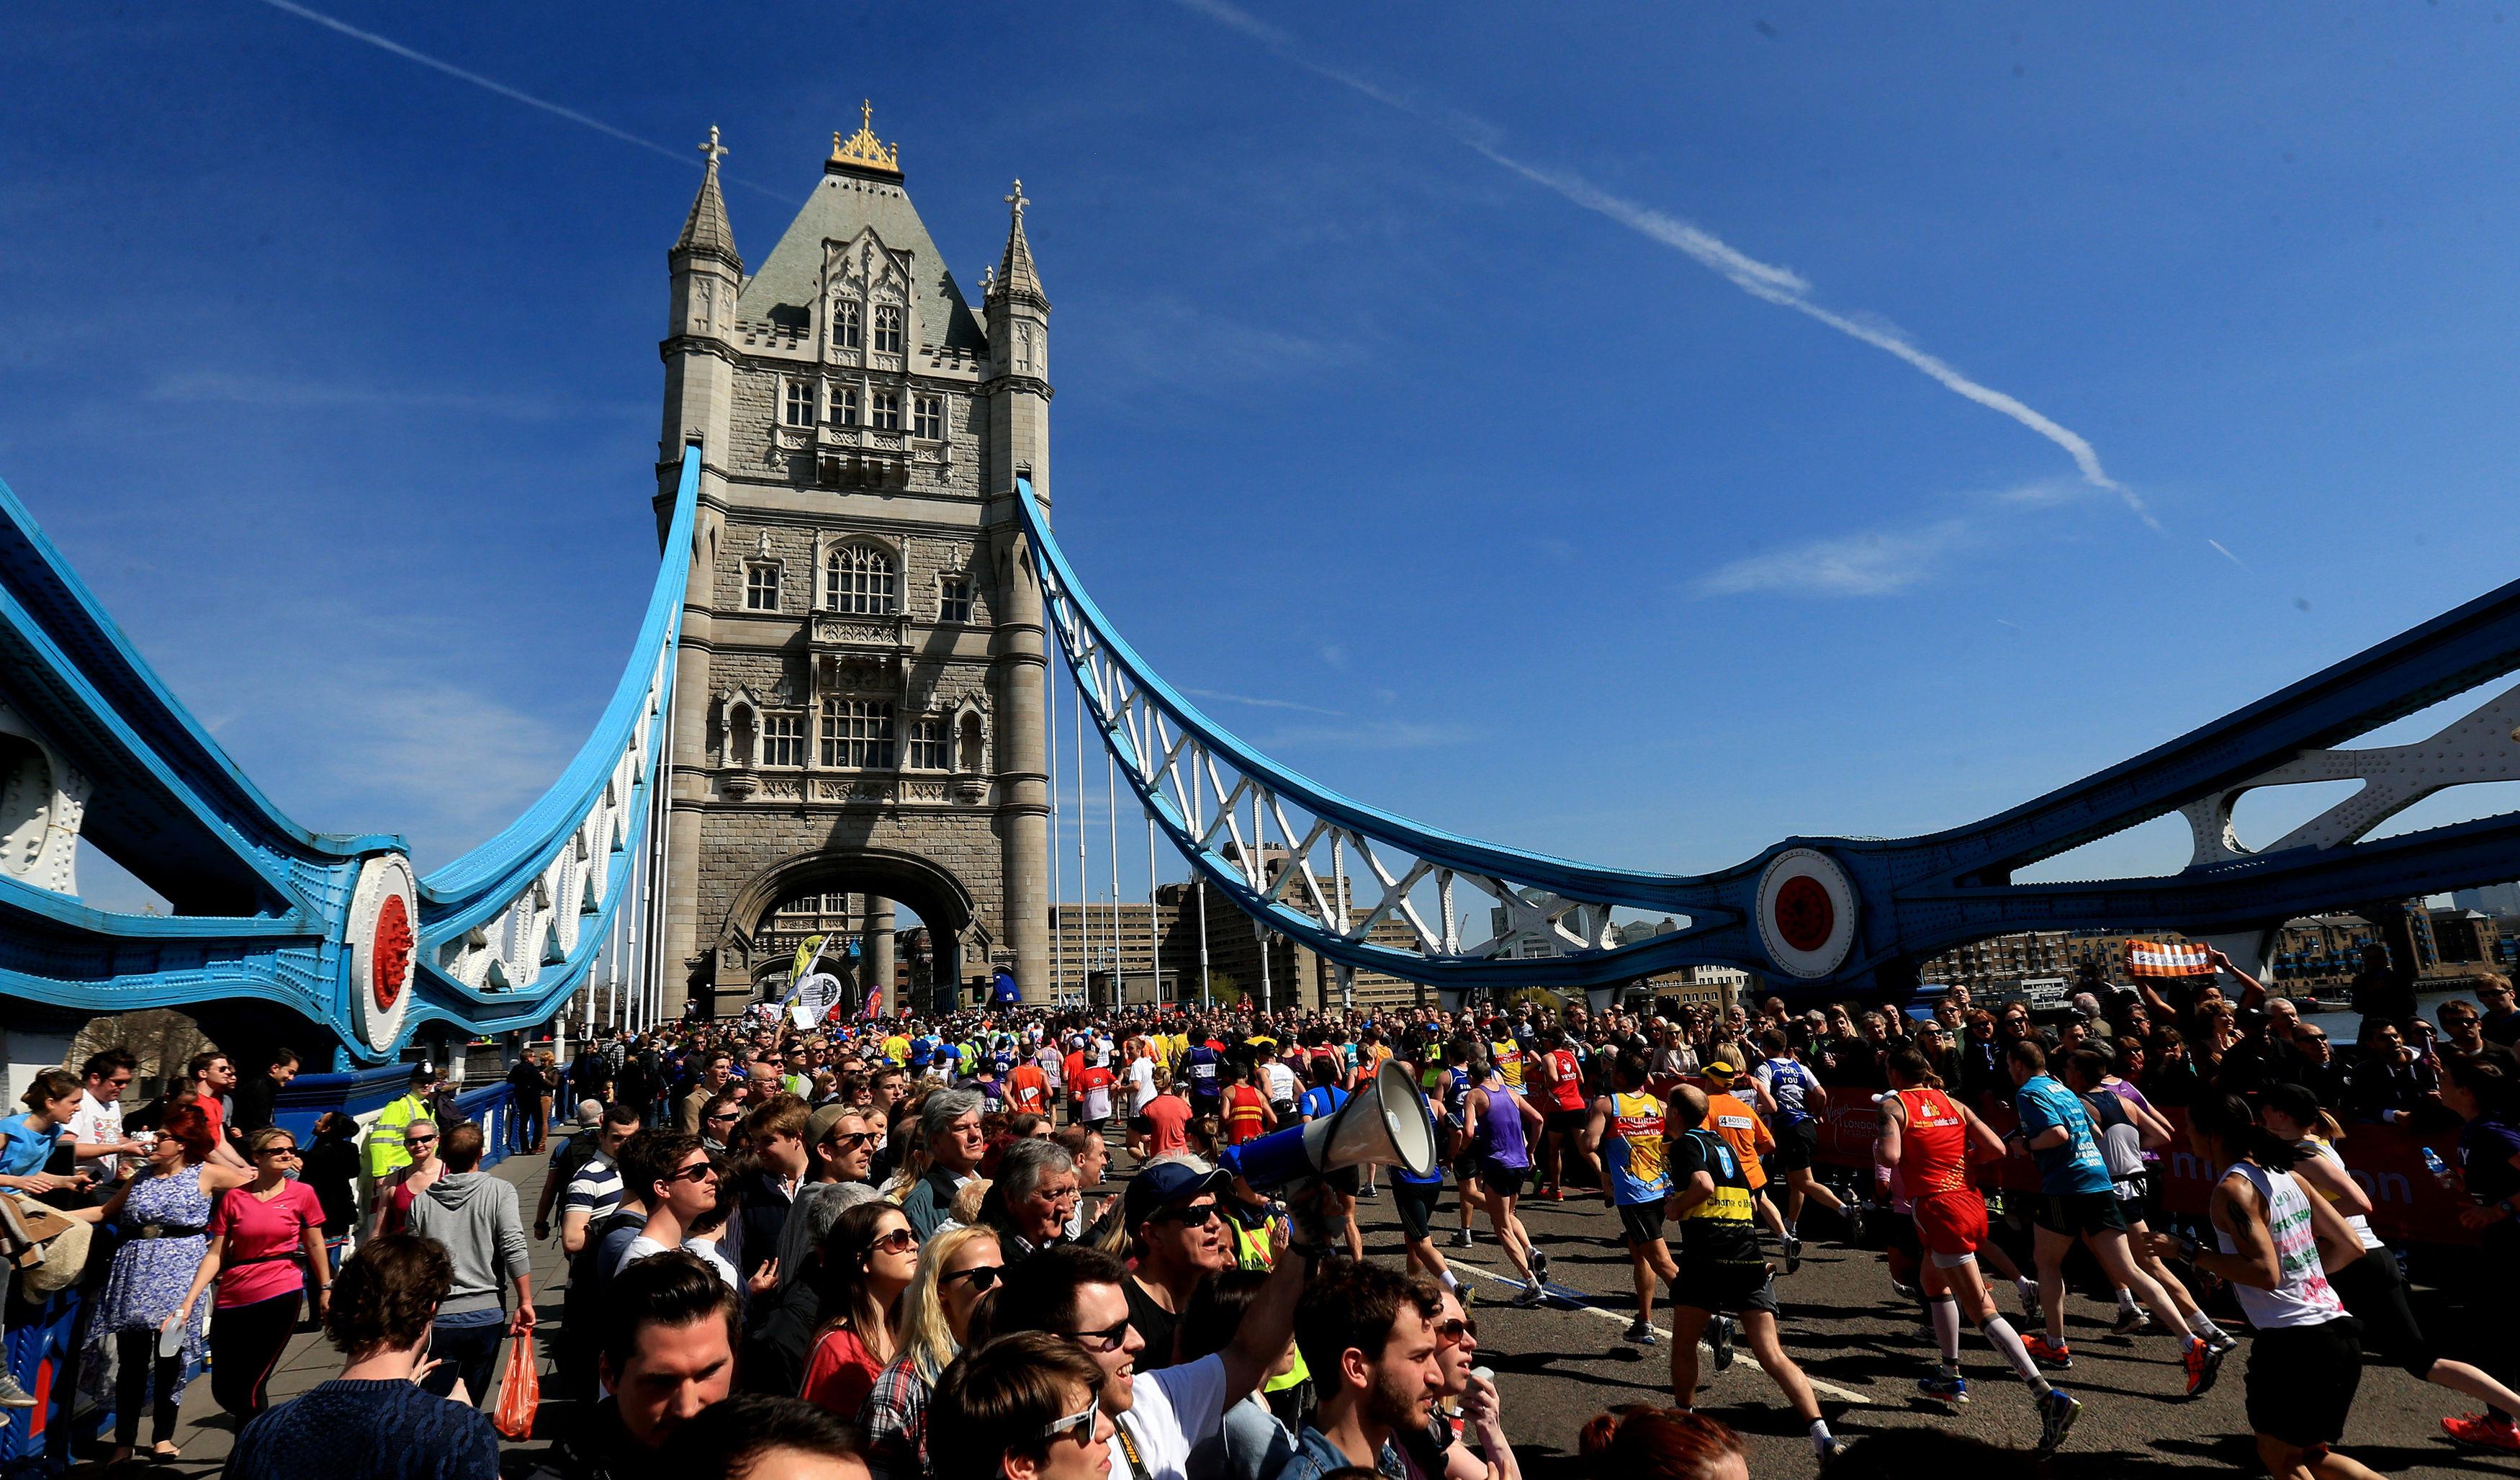 Spectators watch as runners cross Tower Bridge during the Virgin London Marathon in London.